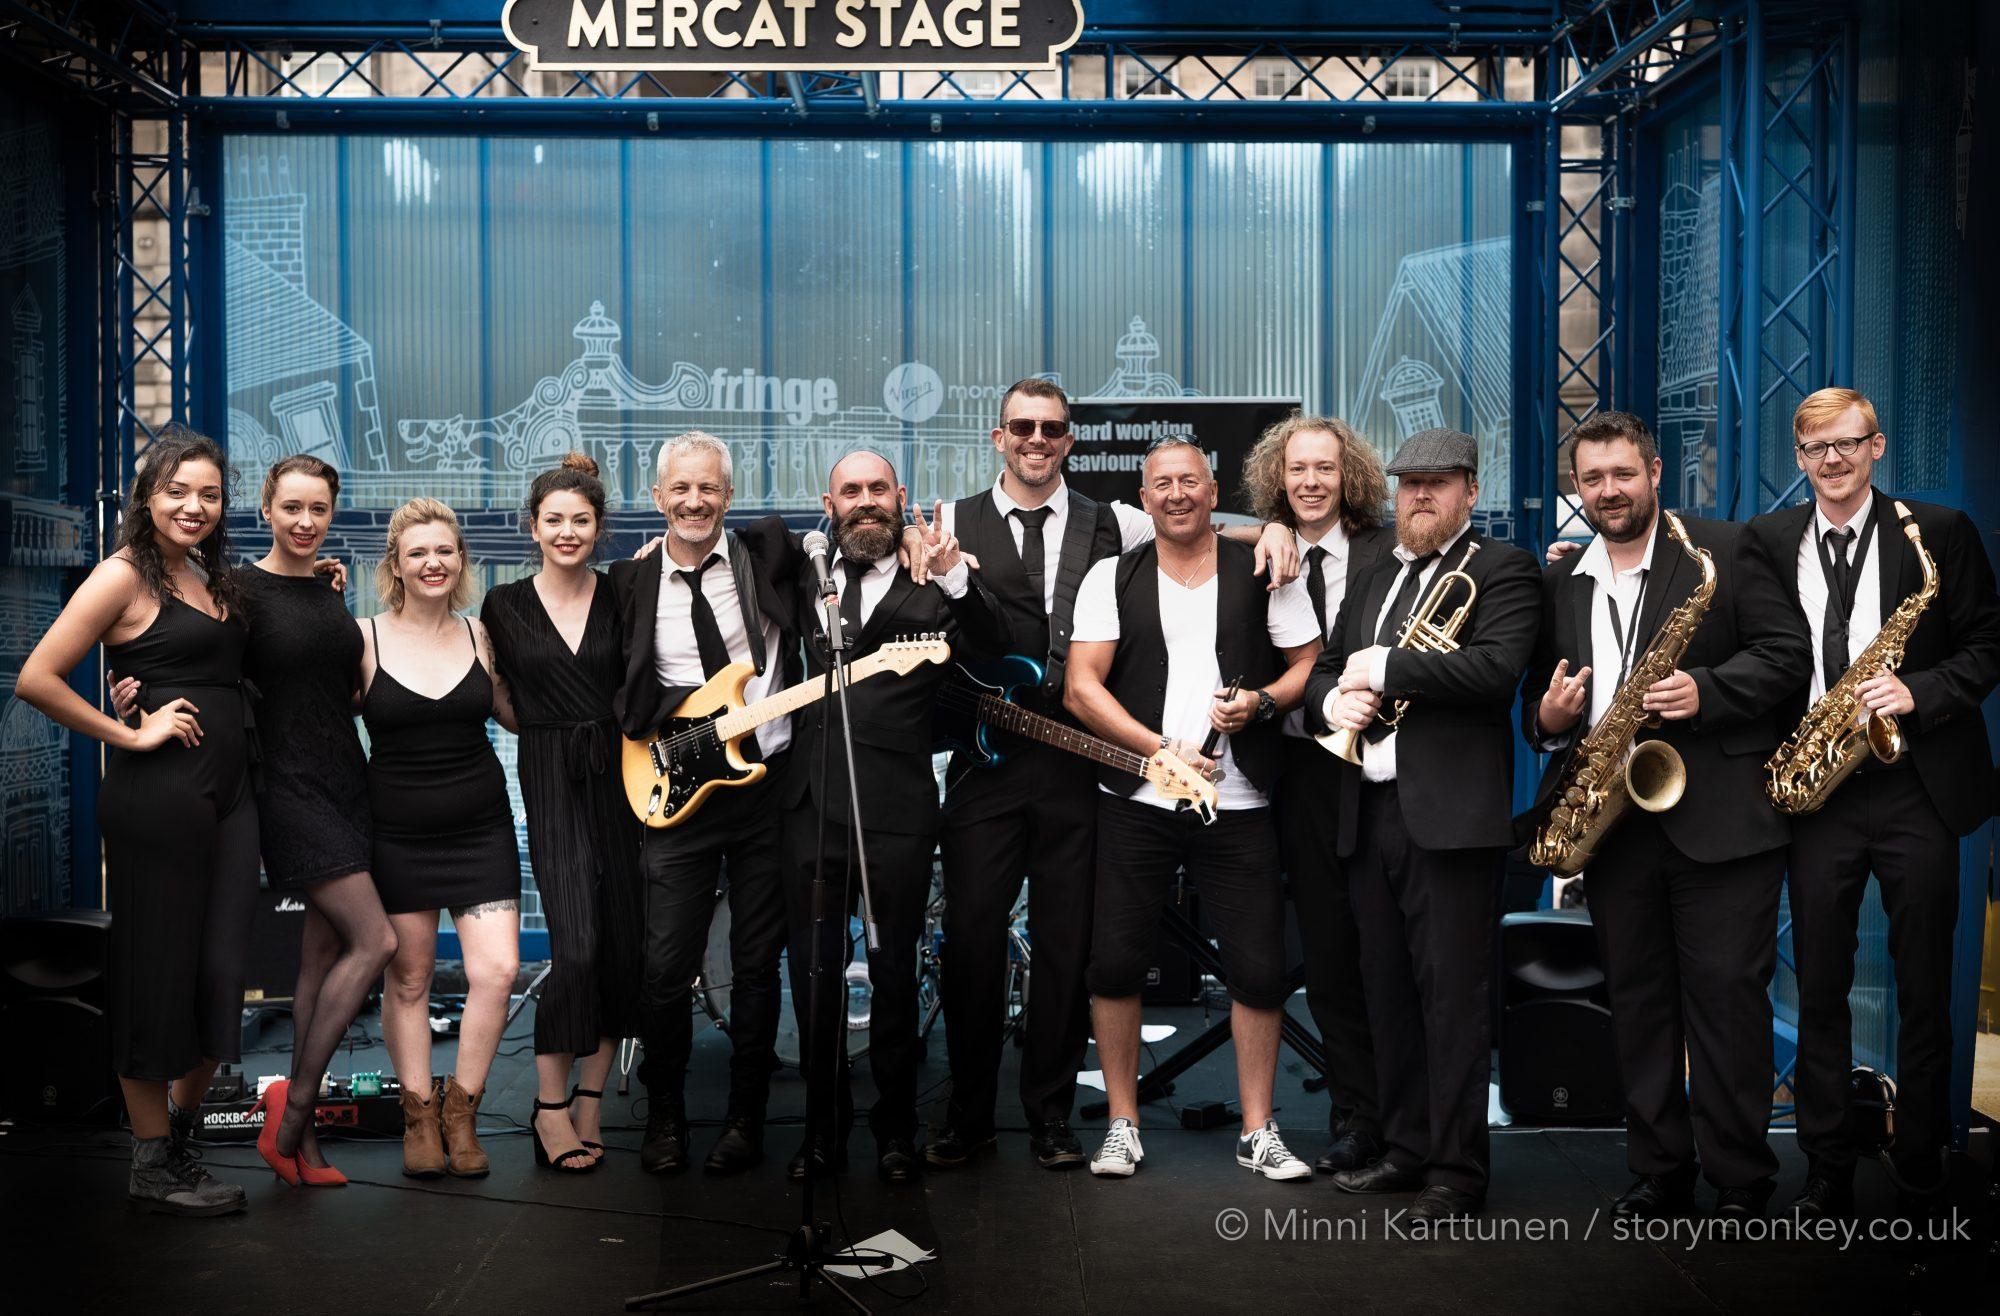 The Lack of Commitments on the Mercat Stage, Edinburgh Fringe Festival